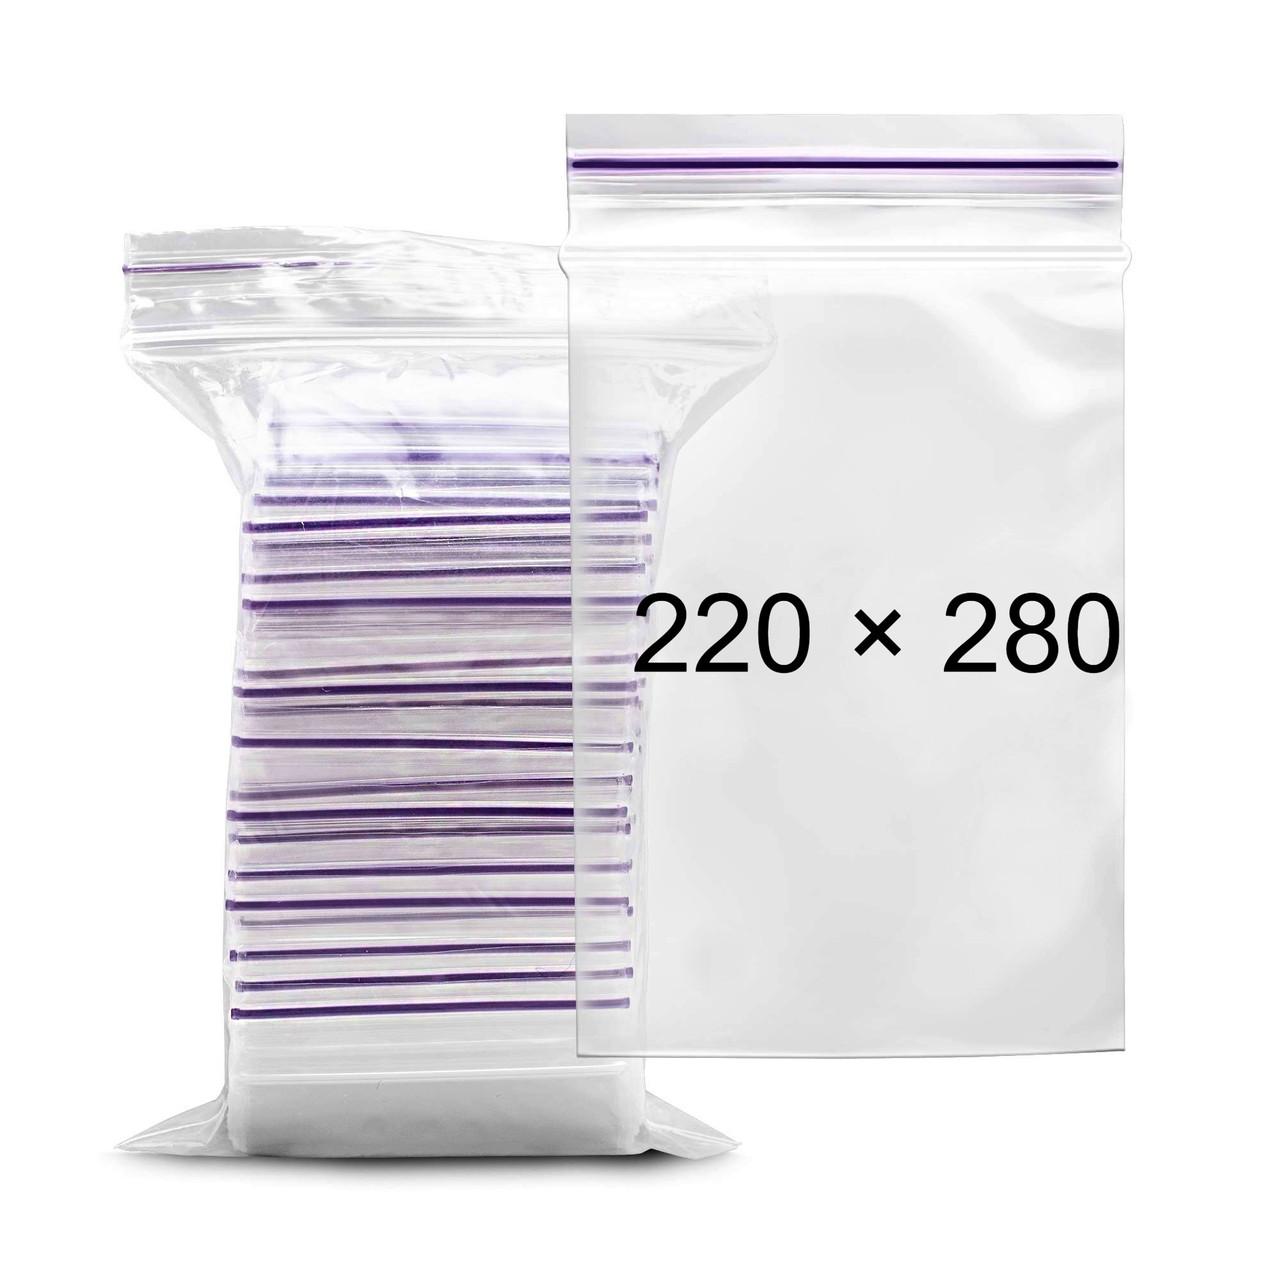 Пакеты с замком Zip-Lock - 220 × 280